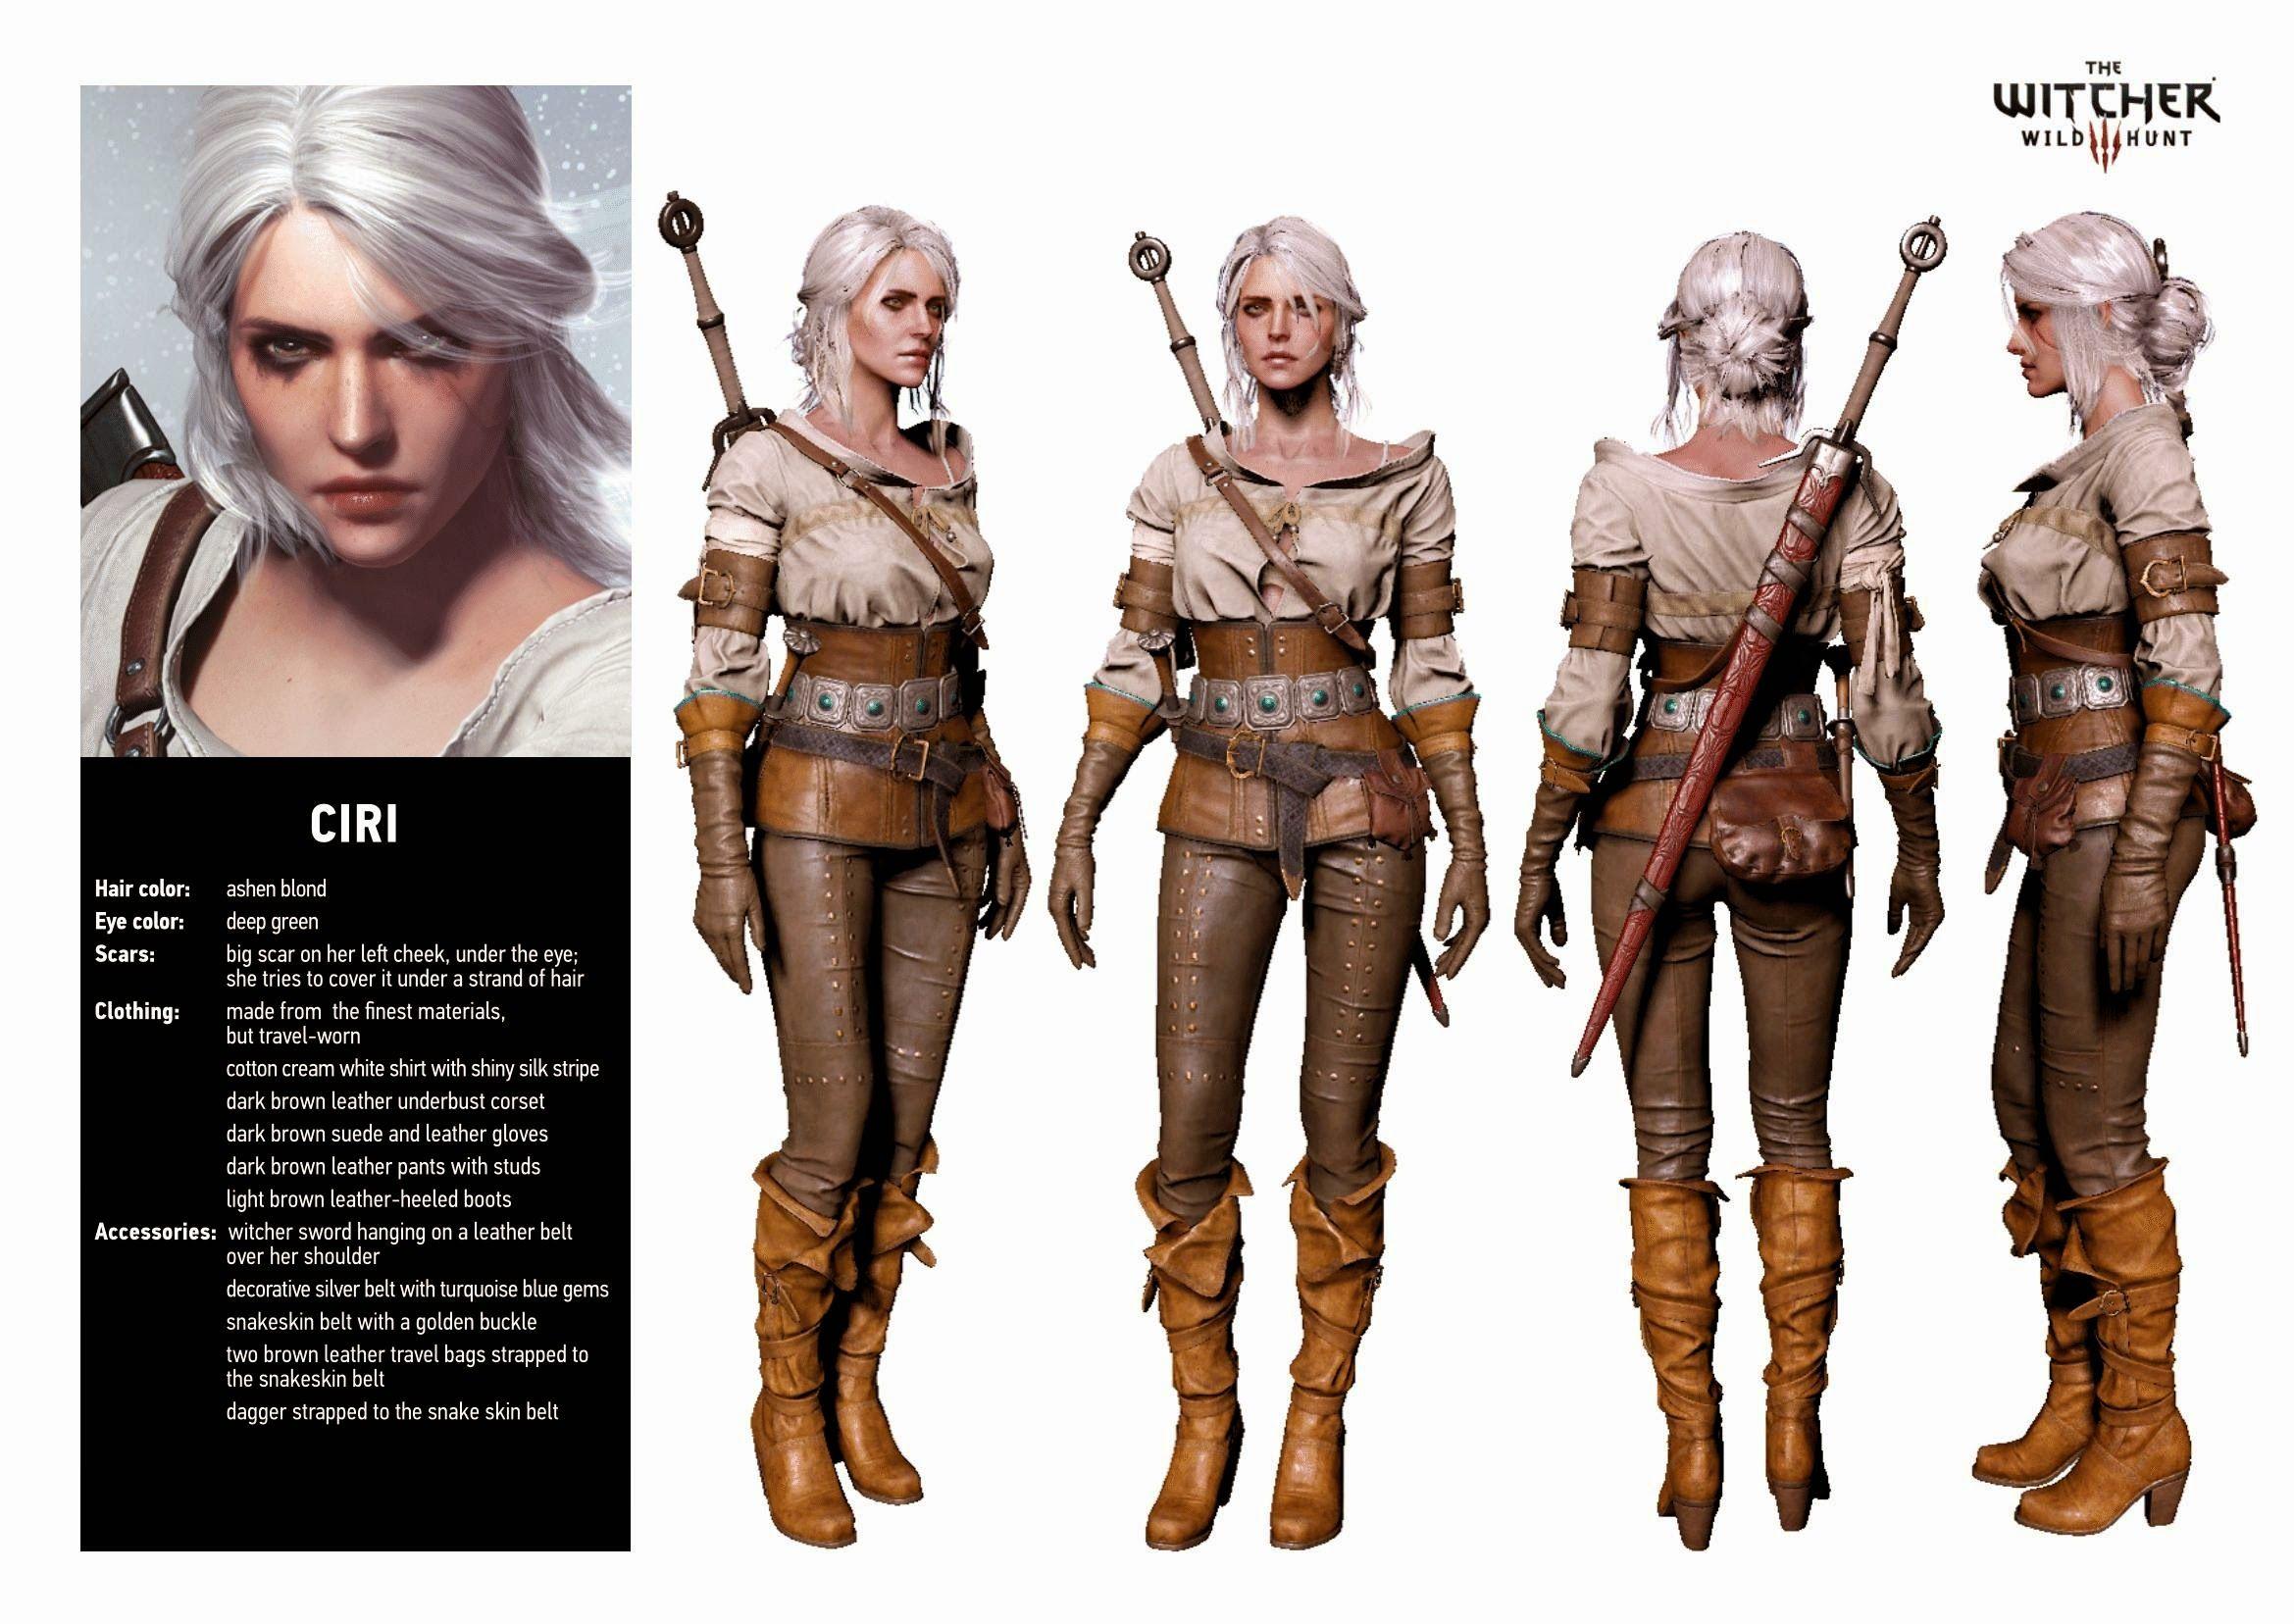 Witcher 3 , Cirilla (Ciri)